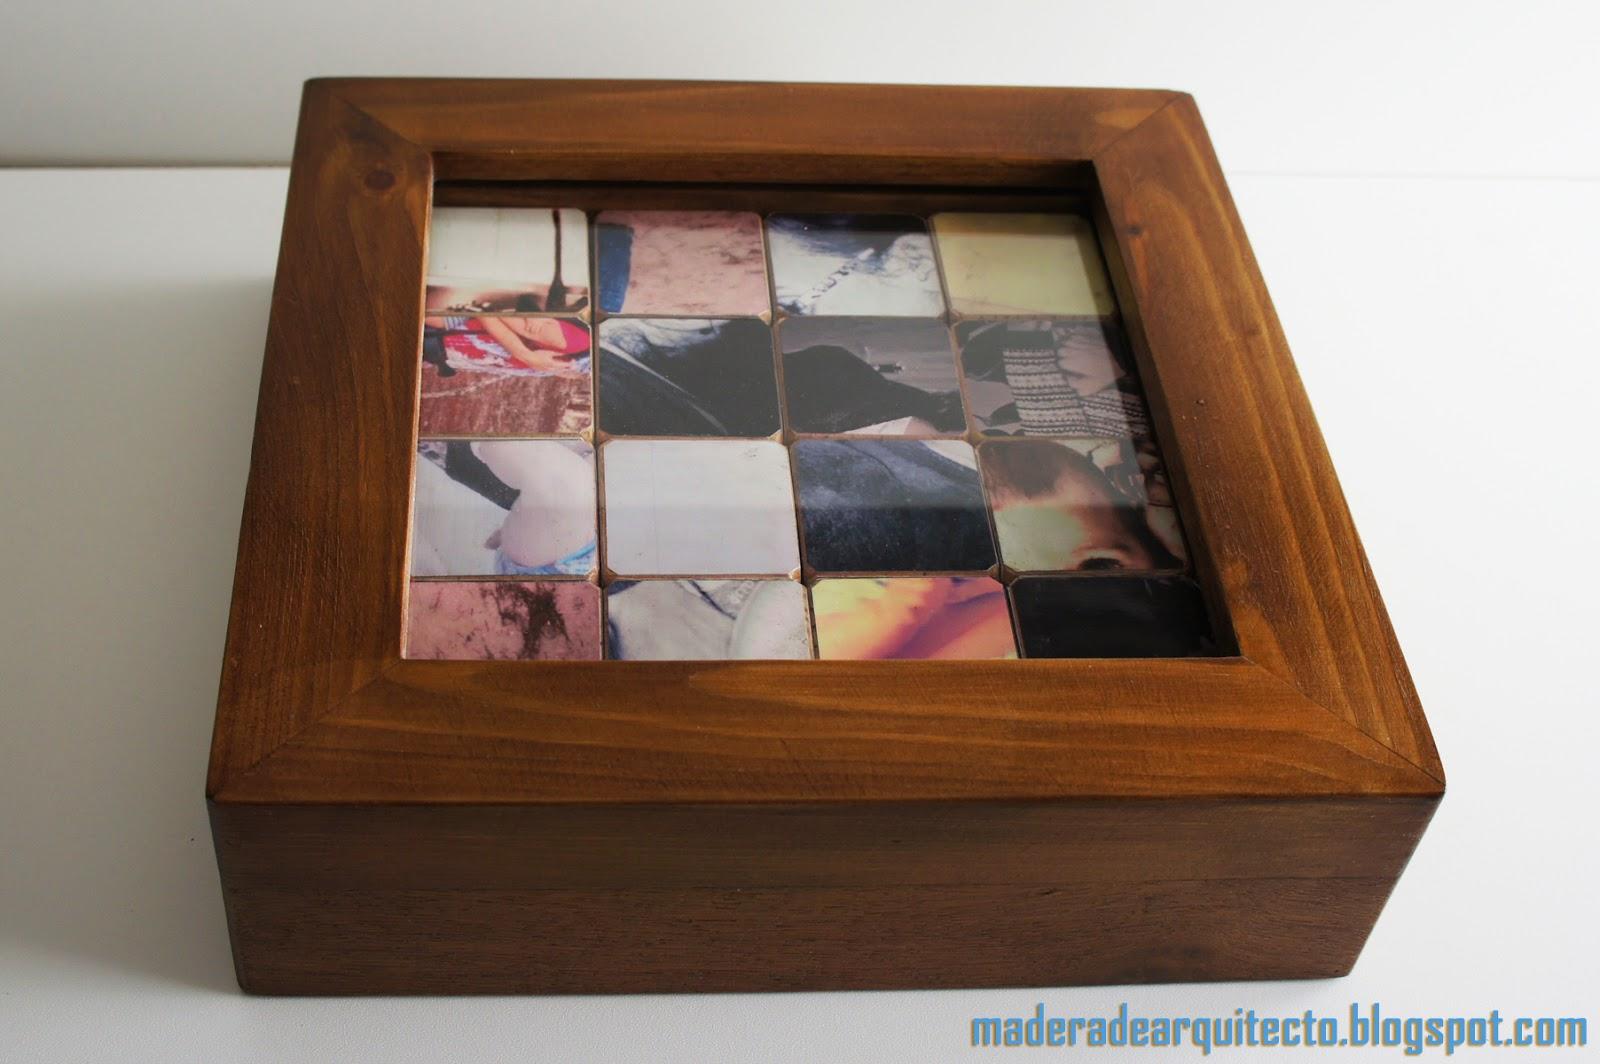 madera de arquitecto: Diseño de objetos. Rompecabezas de madera.